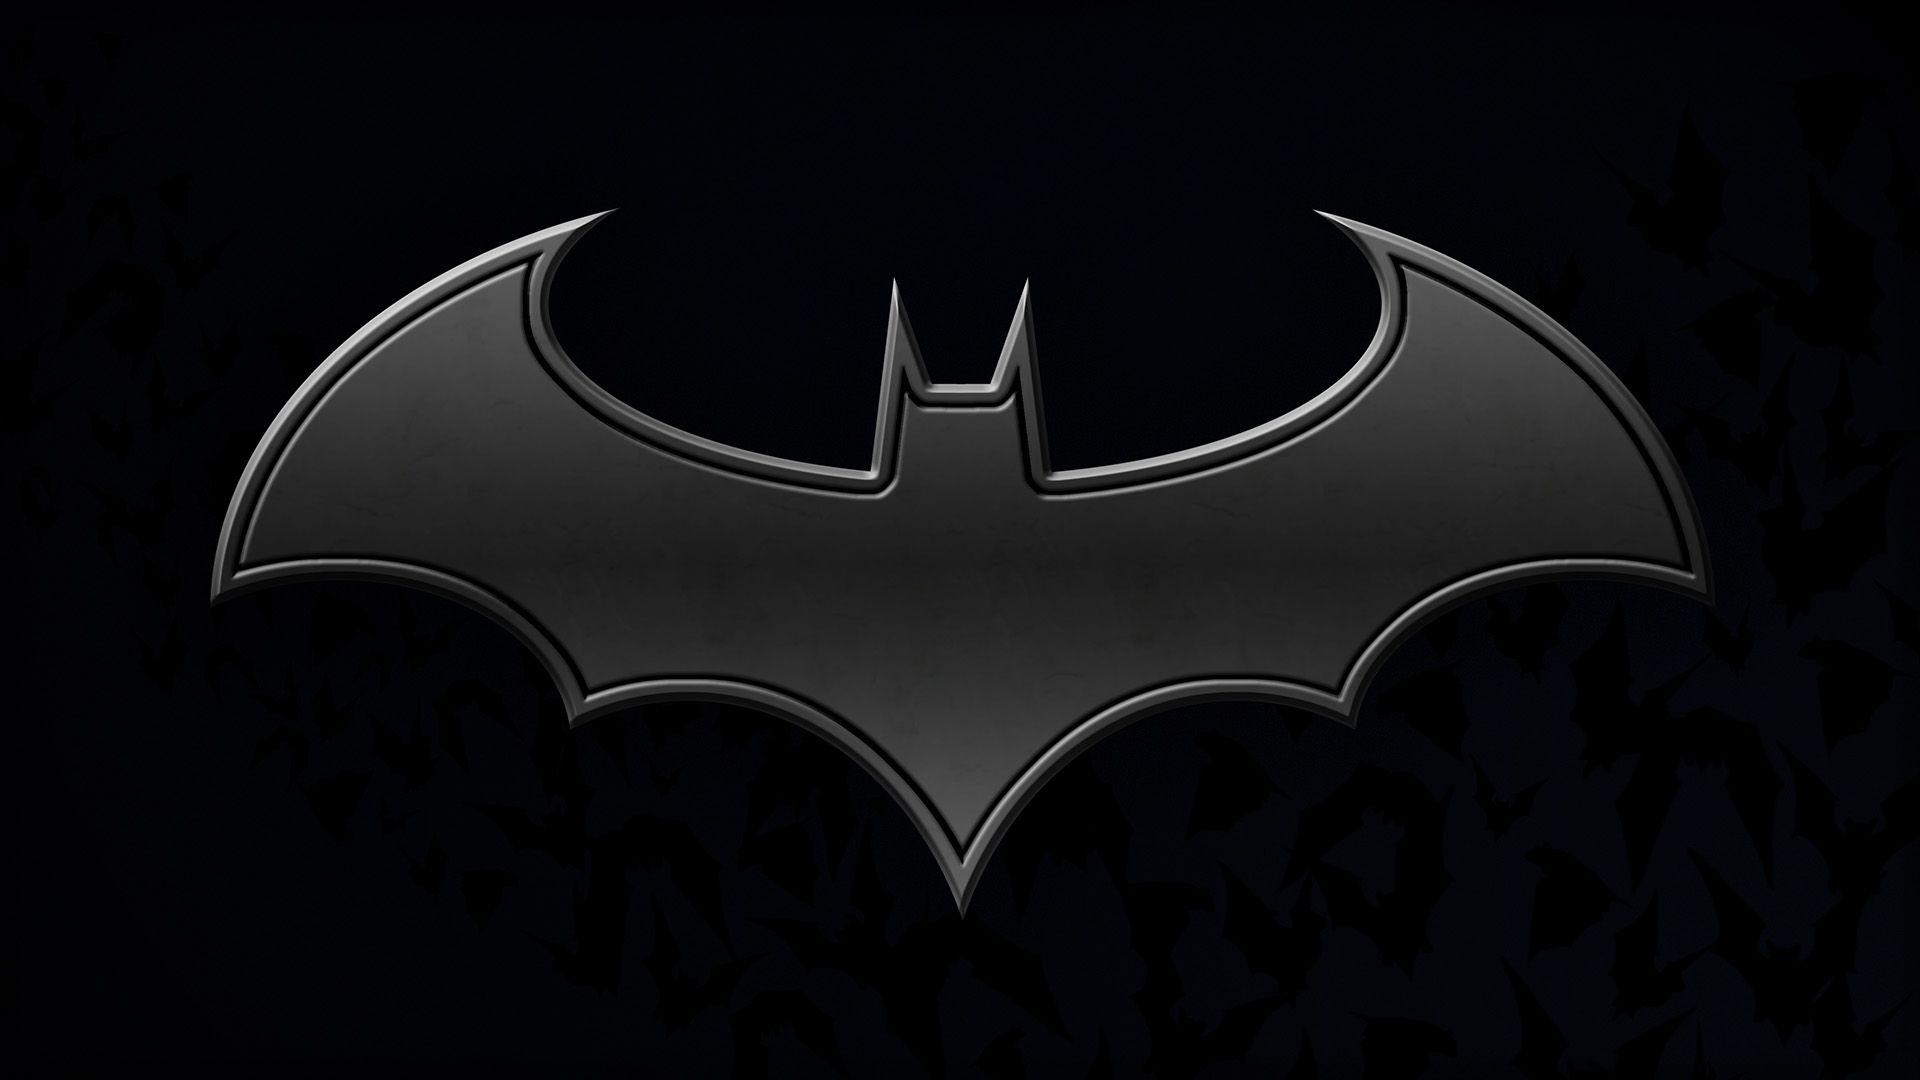 Batman HD Wallpapers For Desktop 1920x1080 Animated 39